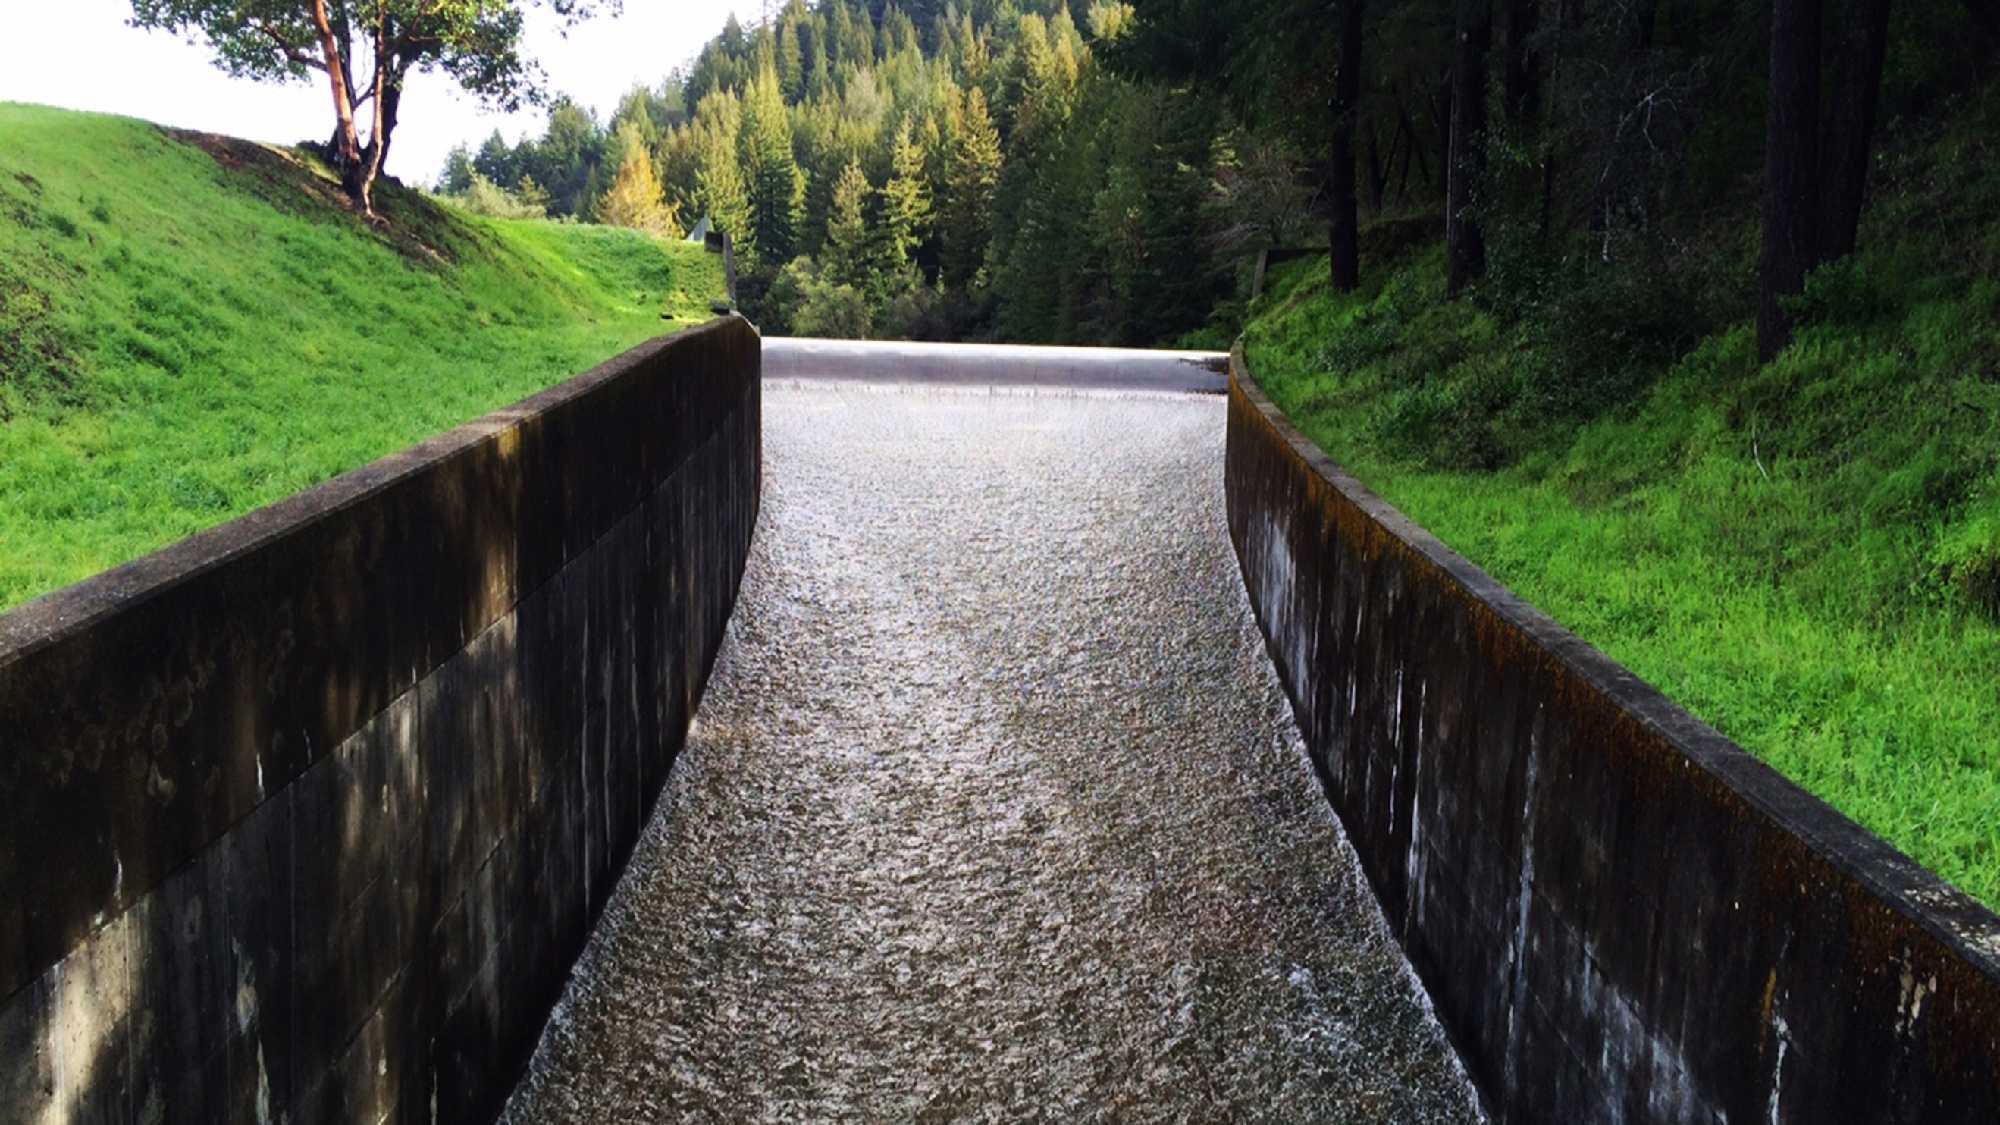 Loch Lomond Reservoir in the Santa Cruz mountains was overflowing on Monday.